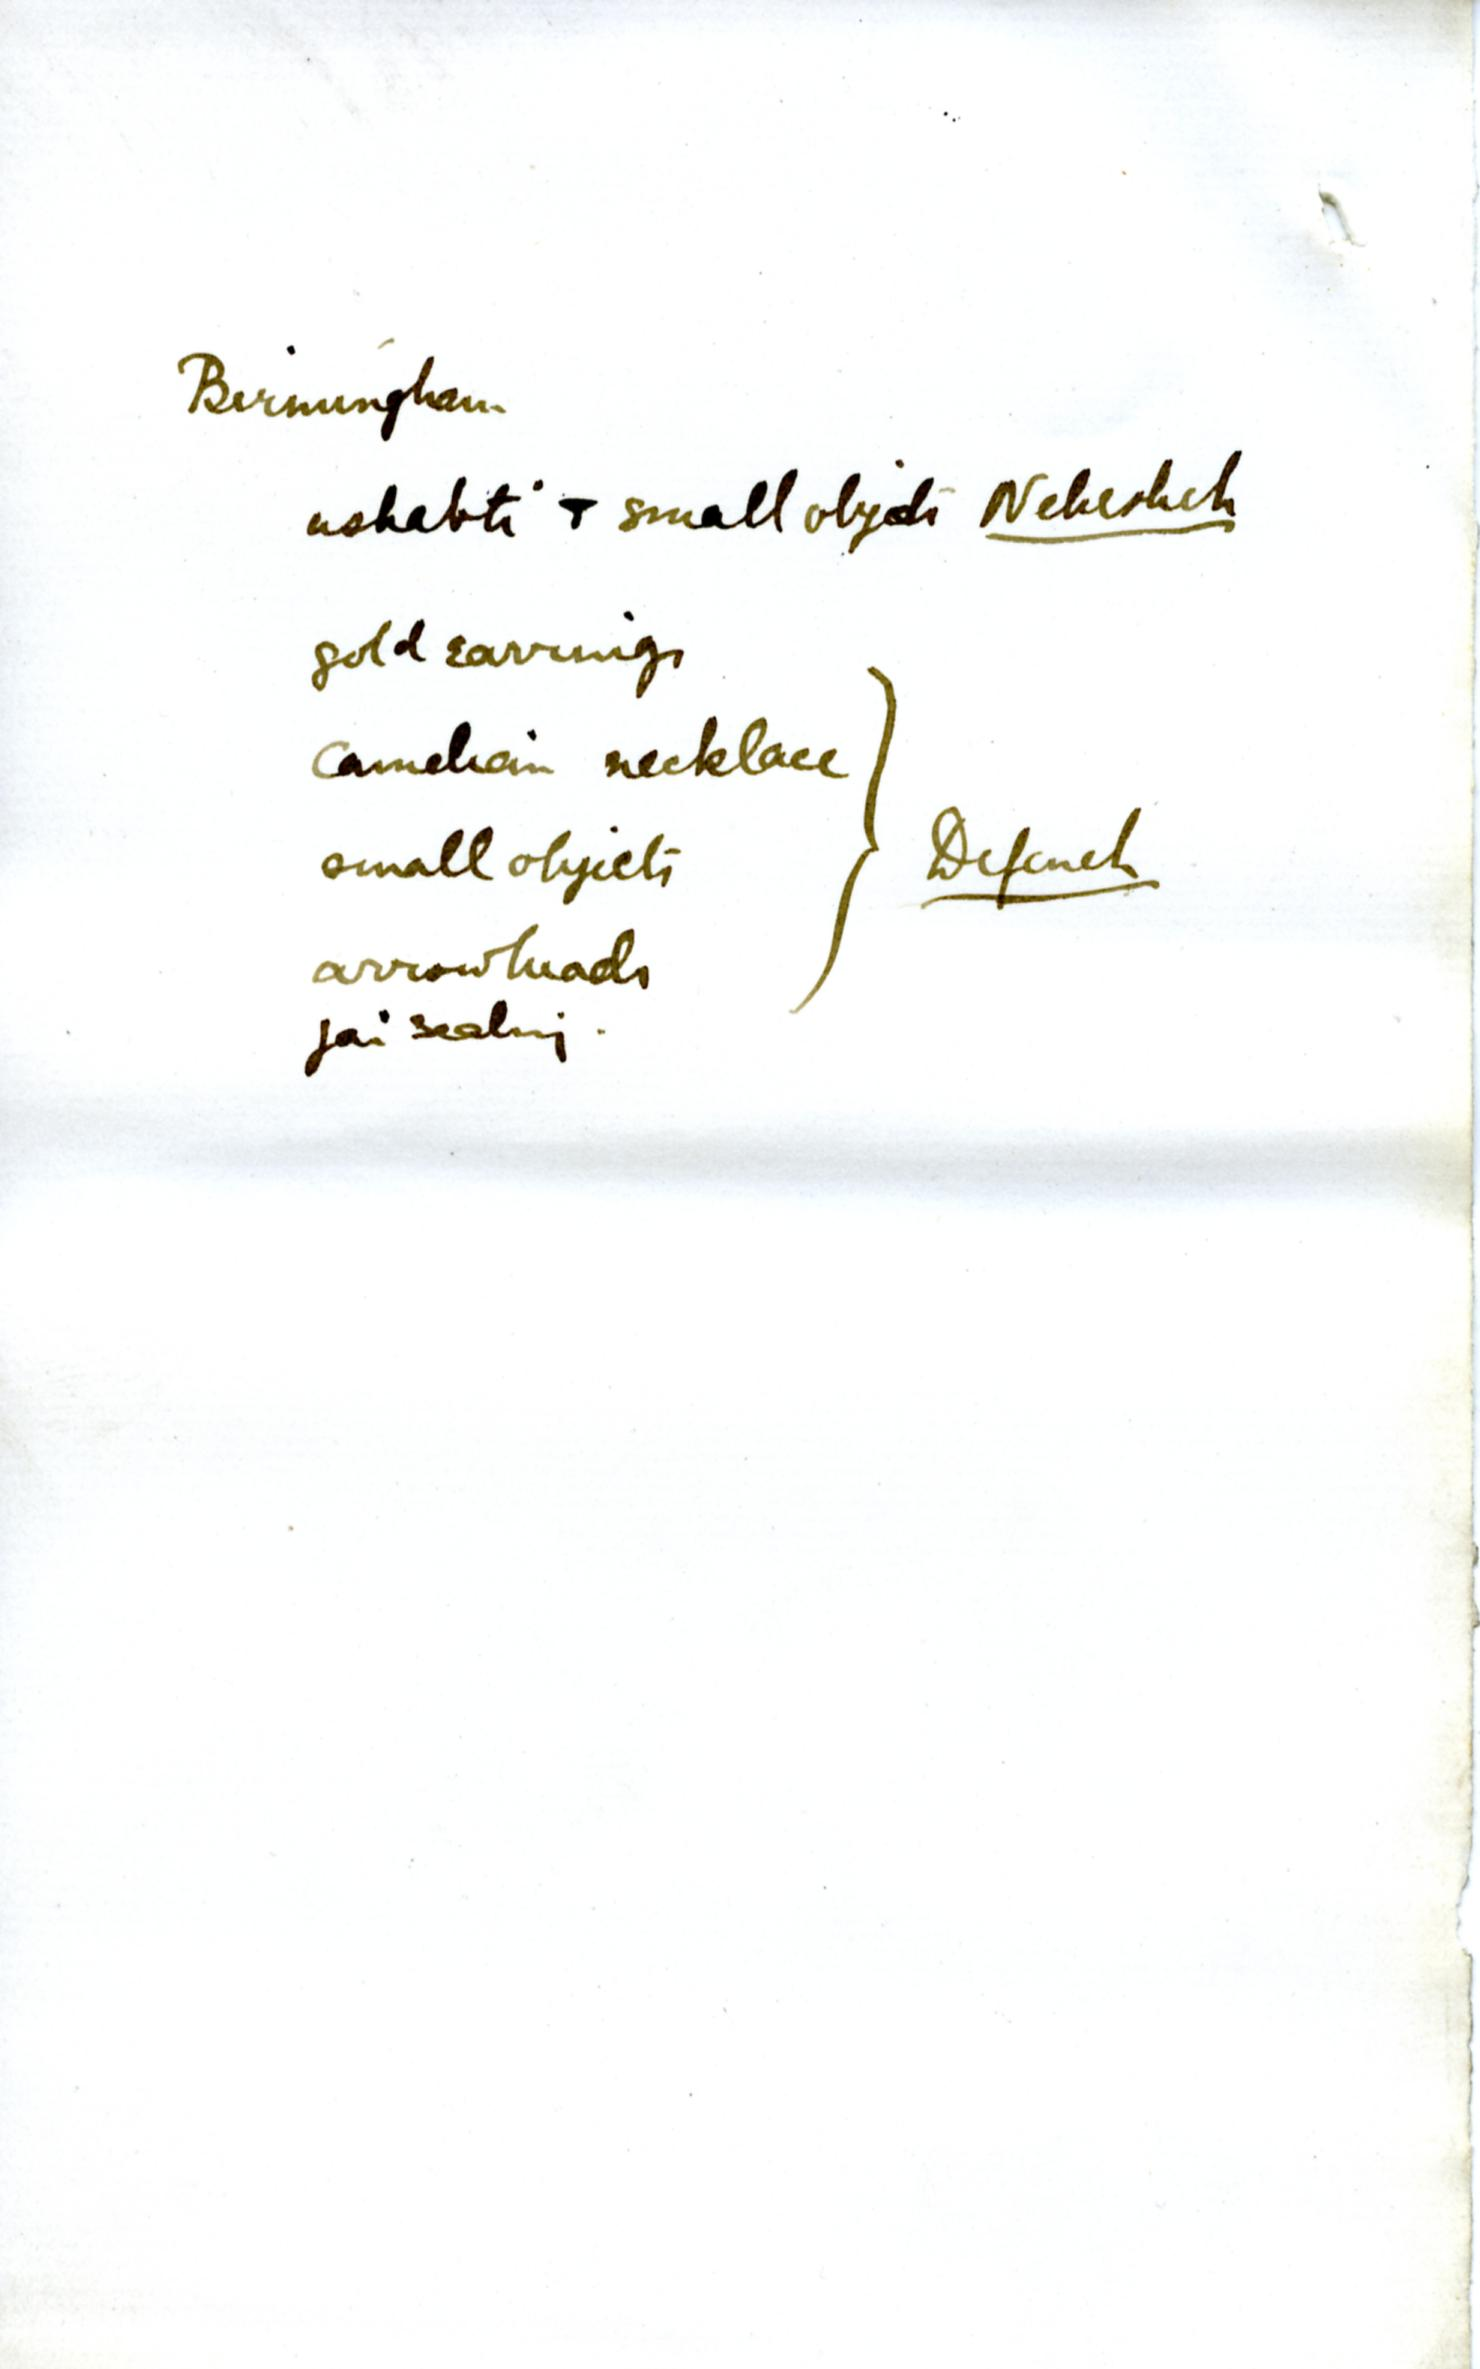 1886 Nebesheh Tell Dafana 1884 el-Qantara, Tell Gemayemi, Tell Sueilin DIST.09.09n